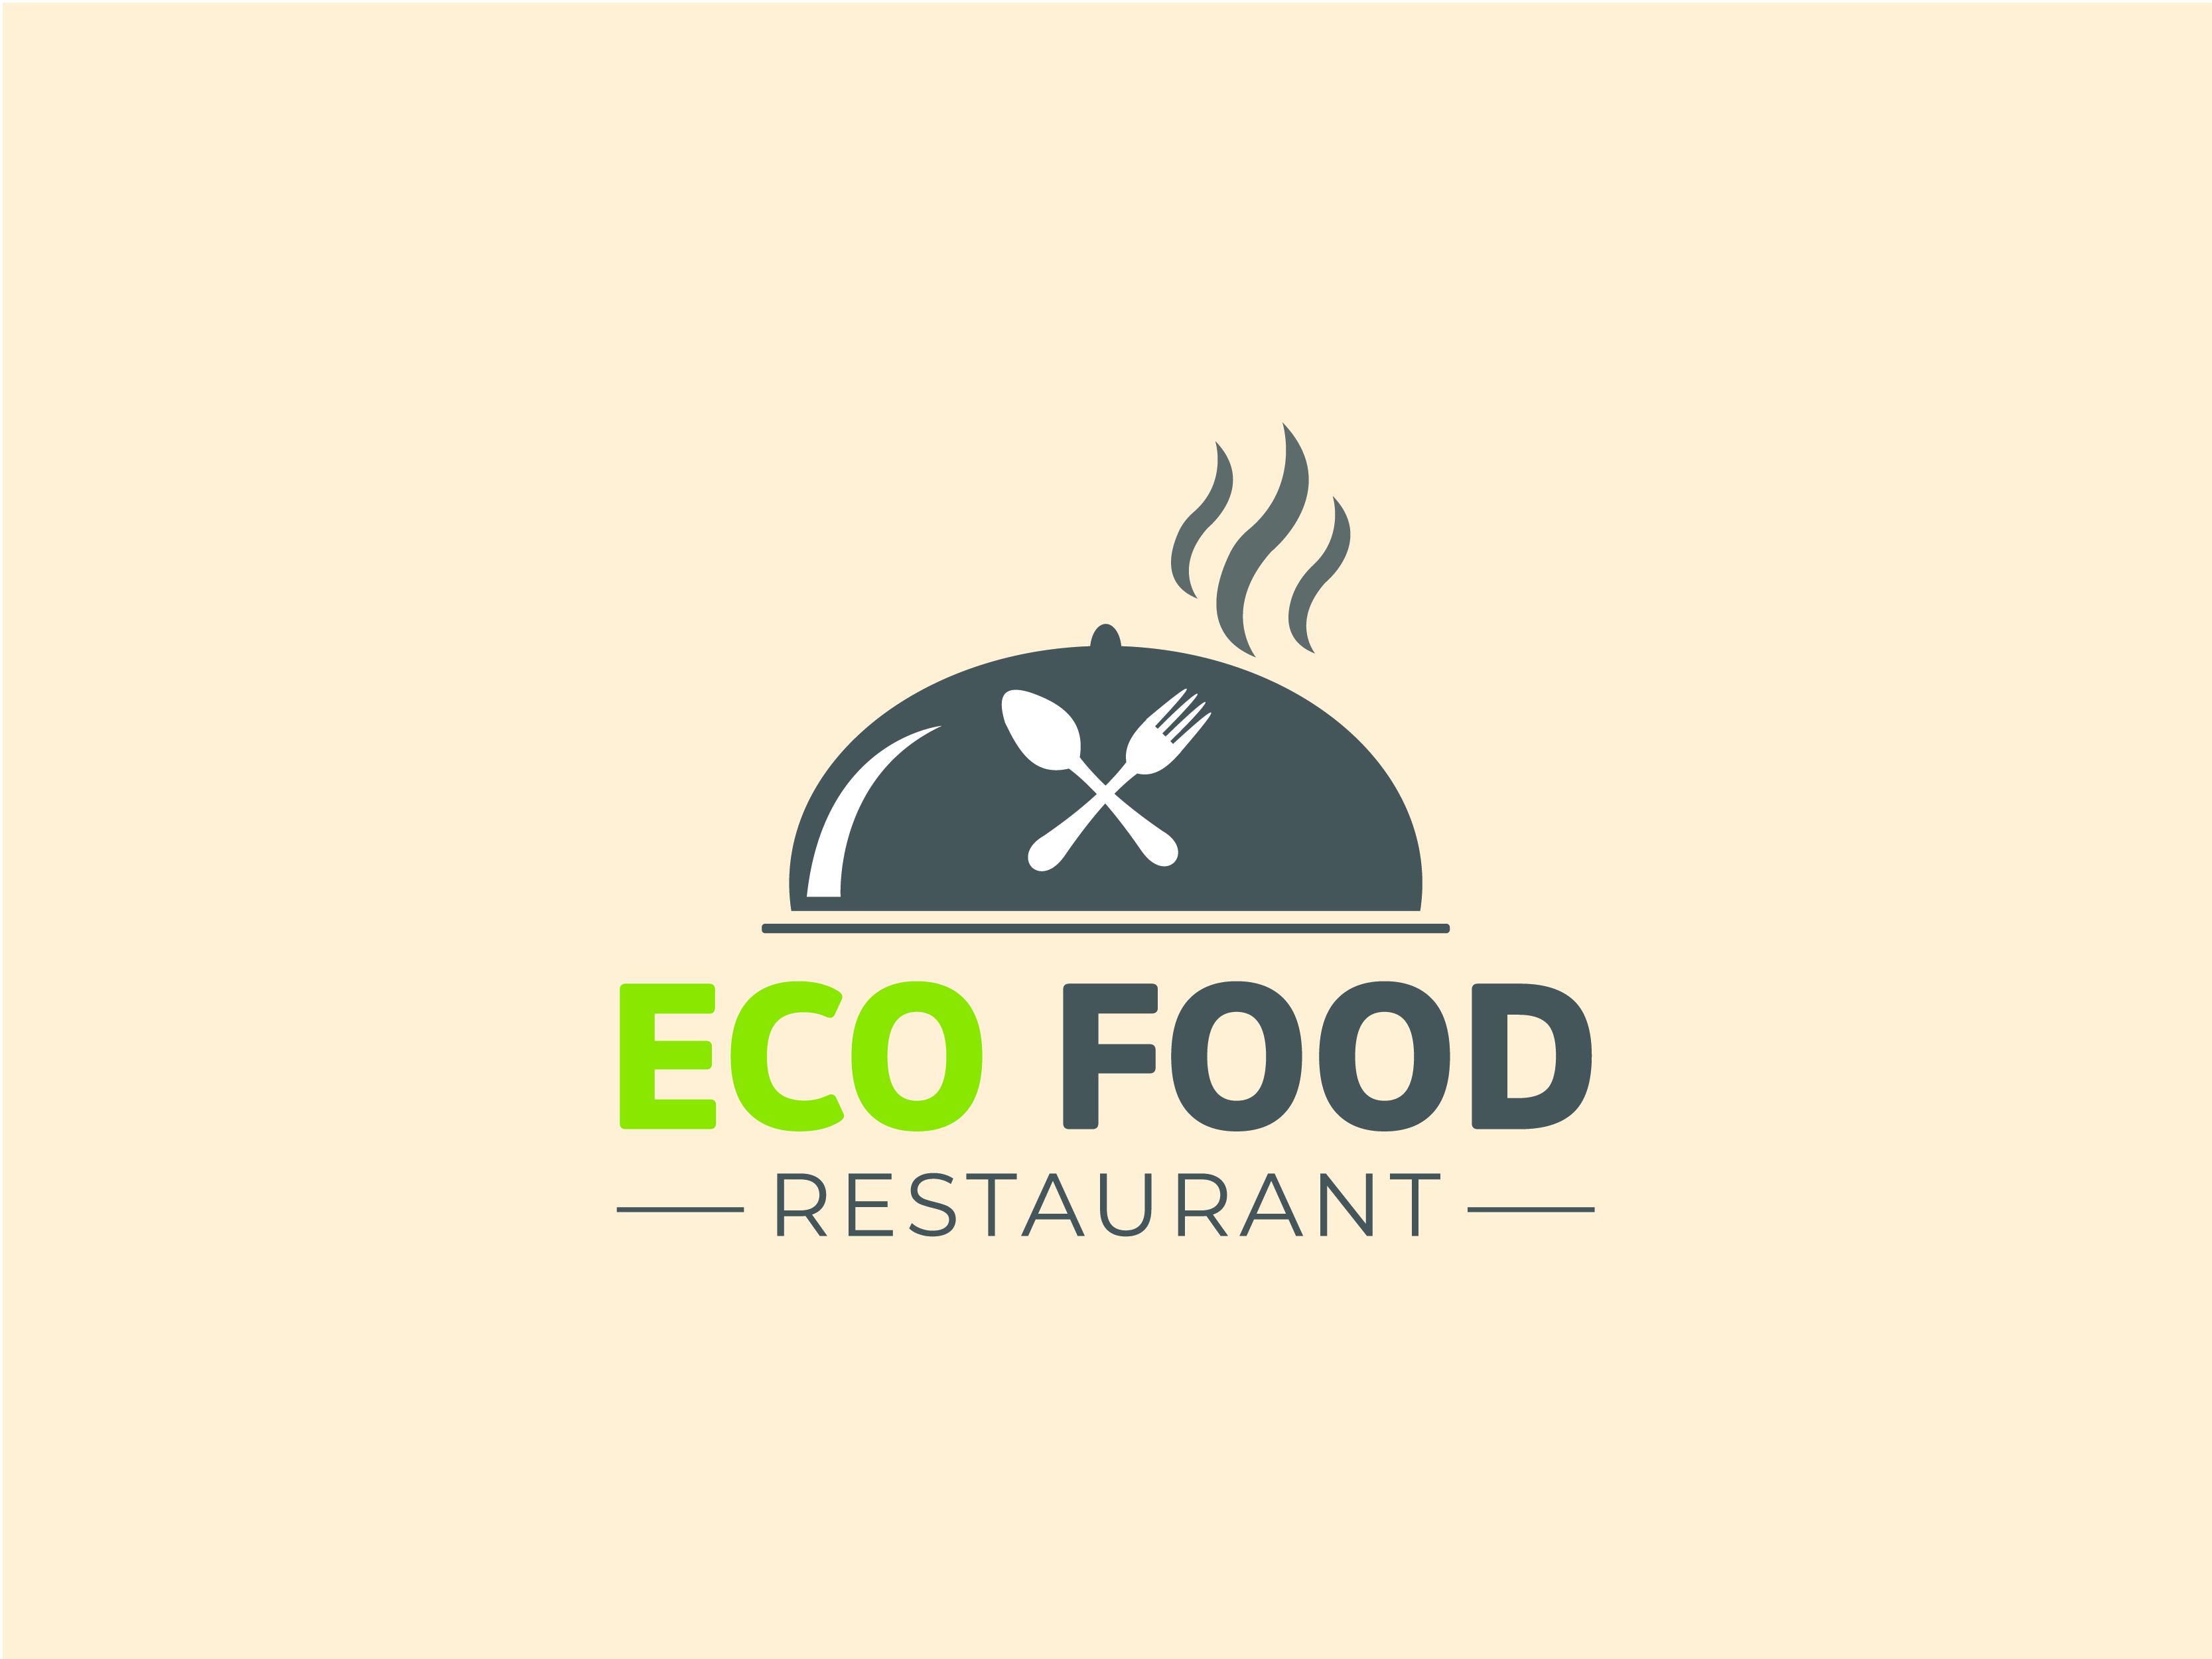 i will design food, cafe, bbq and restaurant logo